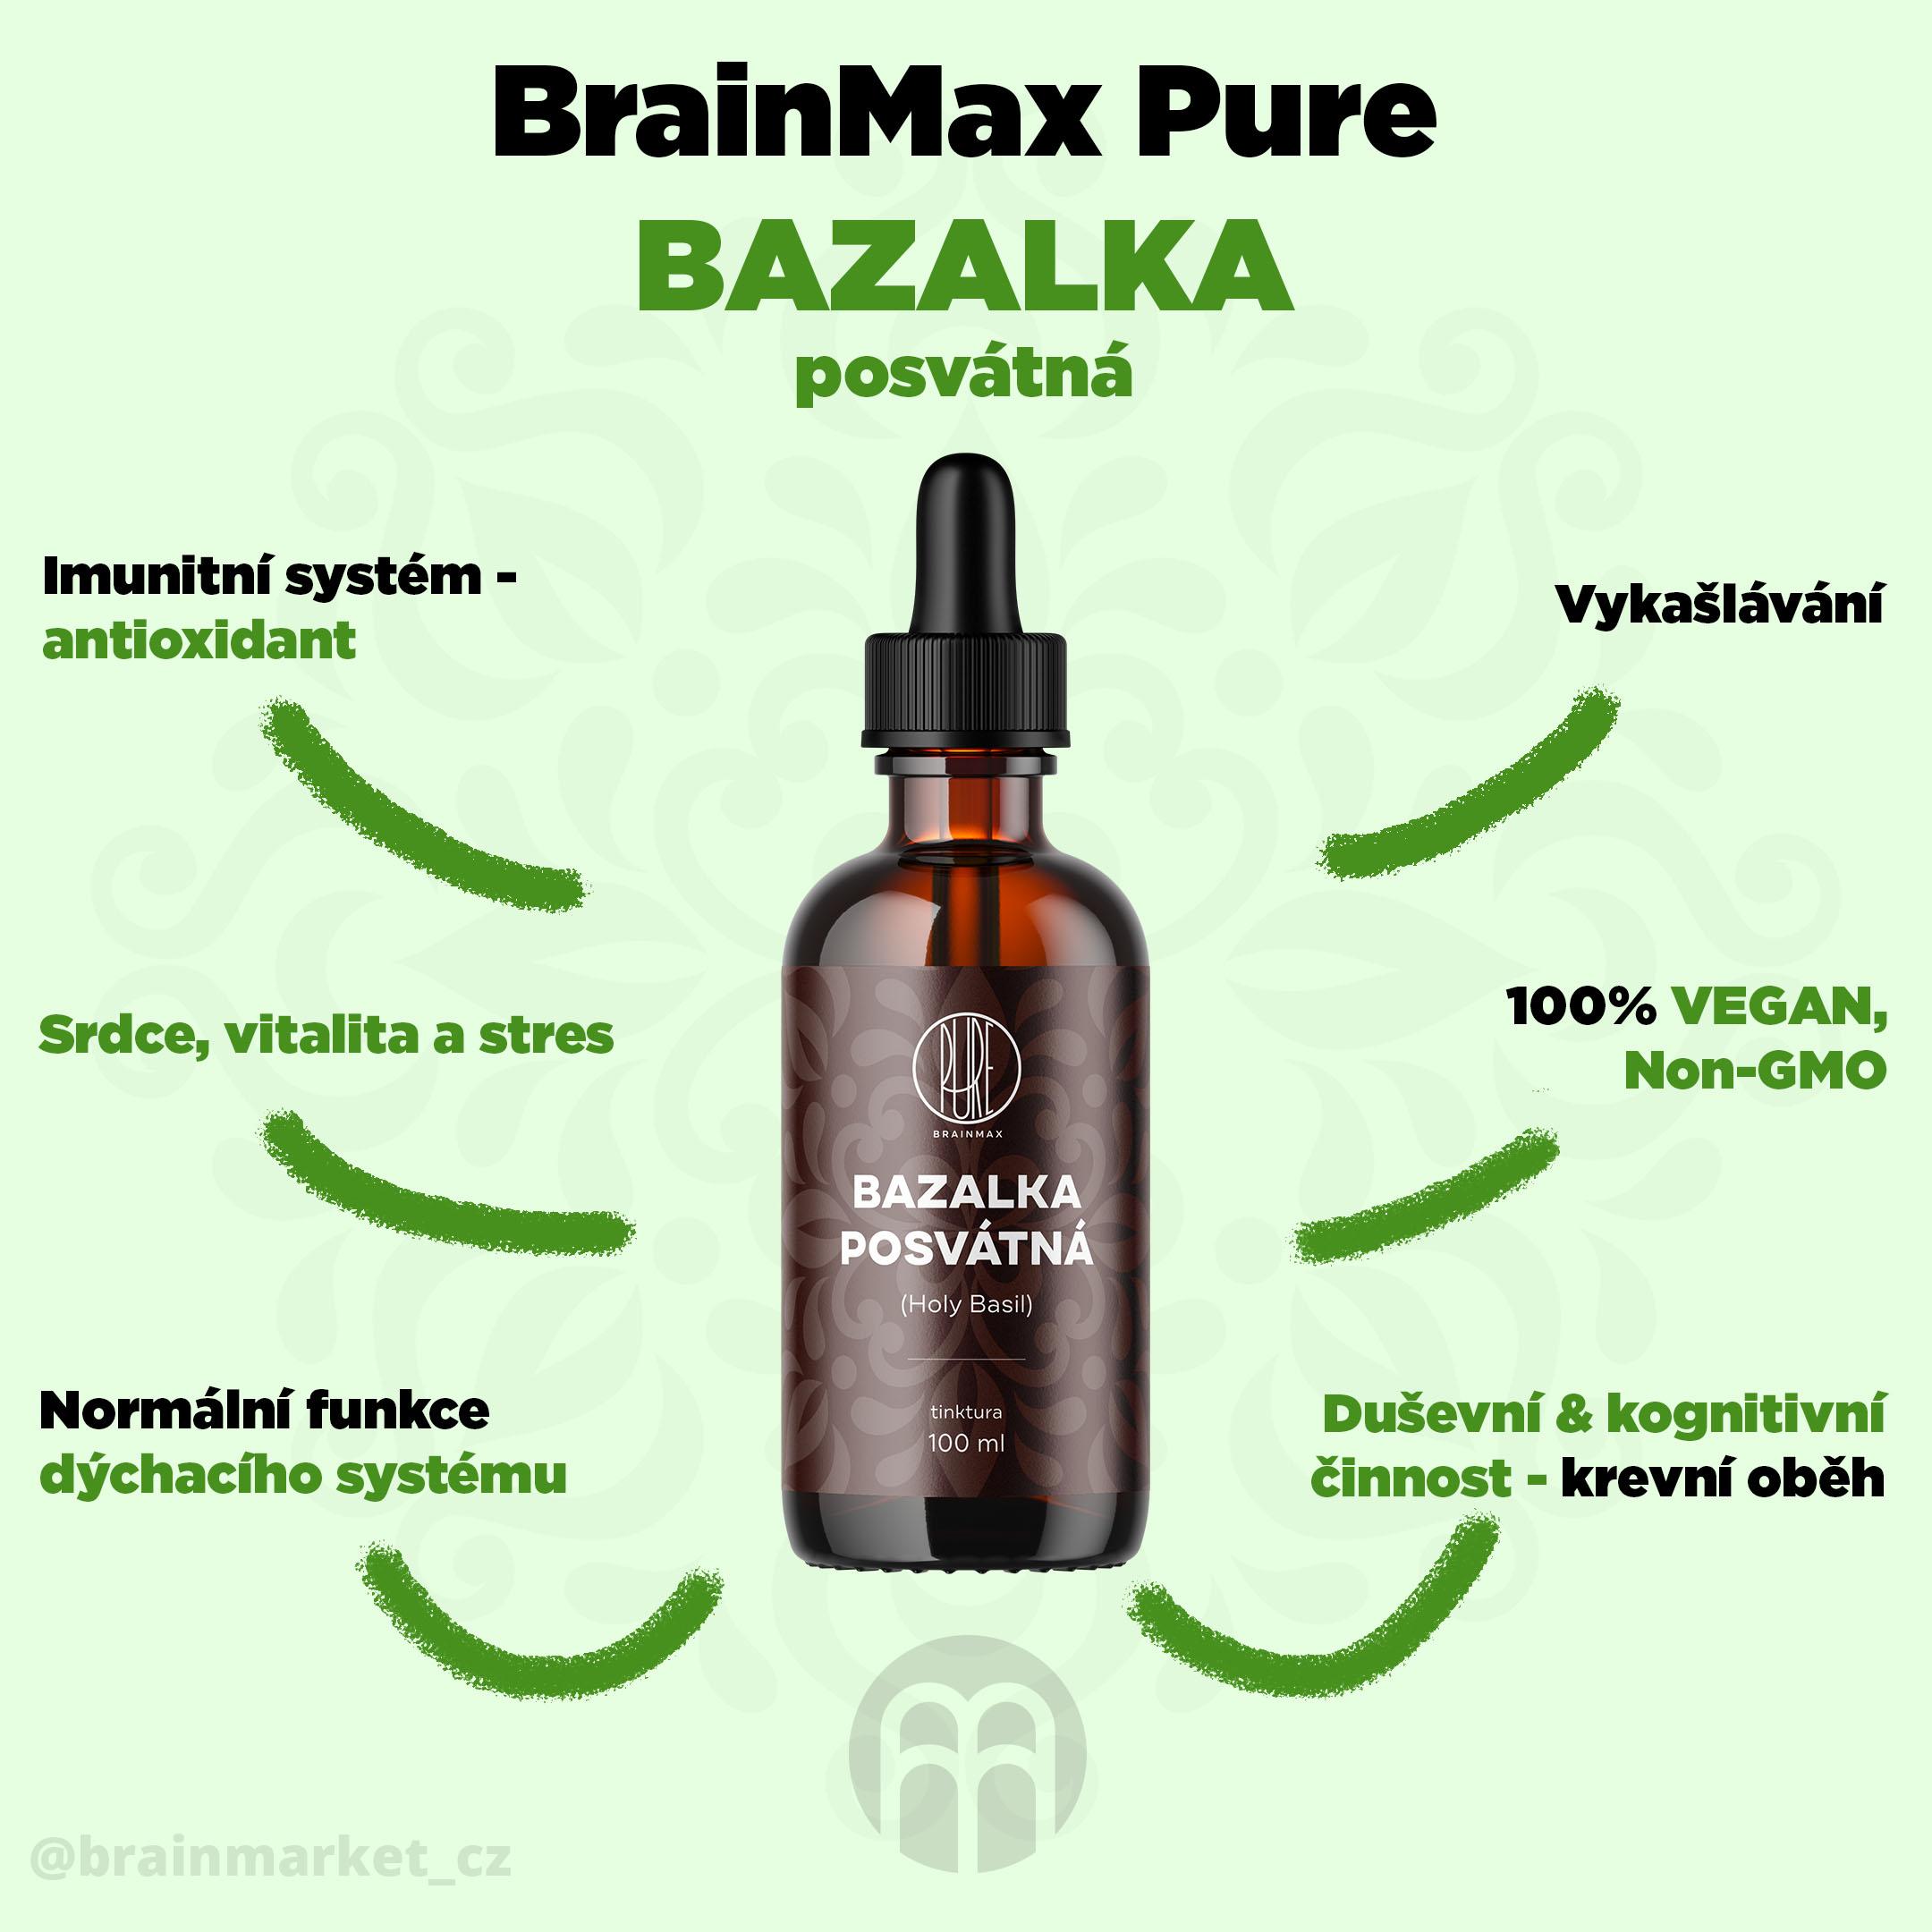 bazalka_infografika_brainmarket_cz